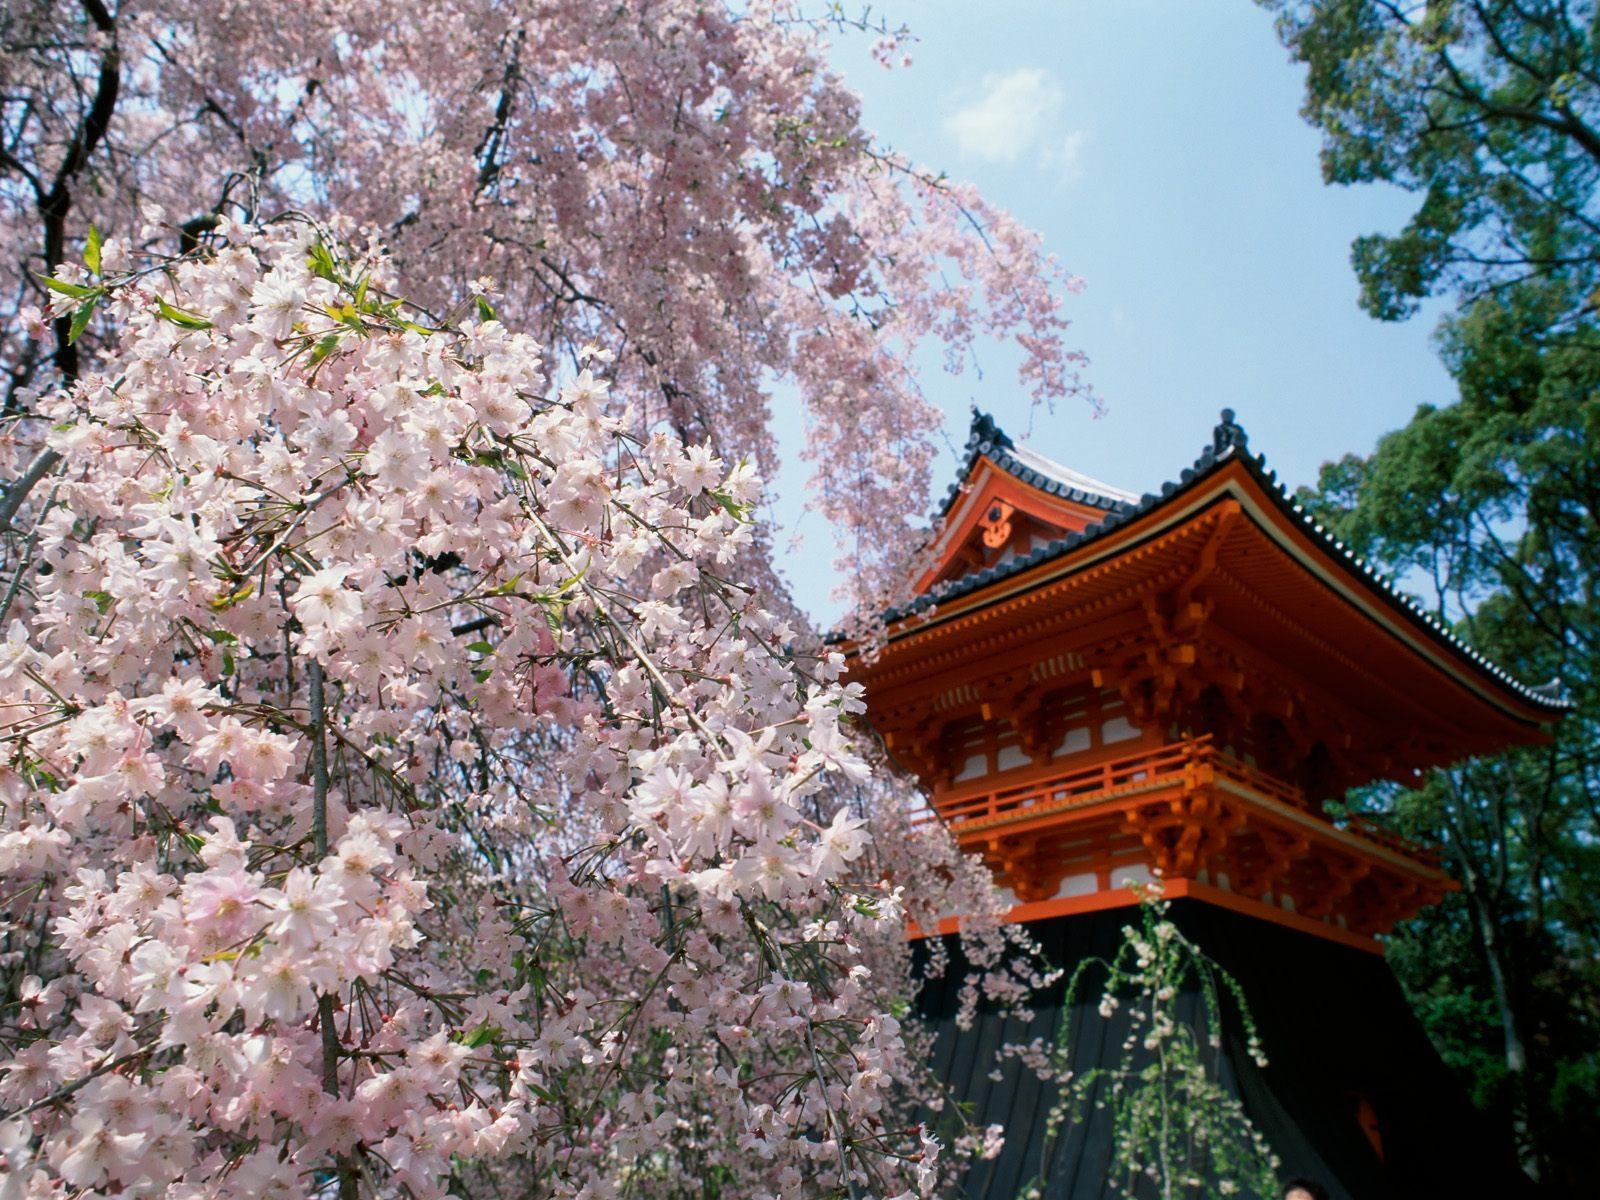 http://2.bp.blogspot.com/_708_wIdtSh0/S_5iQsuD5FI/AAAAAAAABEY/pKi0RULJmxY/s1600/Cherry+Blossoms,+Ninnaji+Temple,+Kyoto,+Japan.jpg